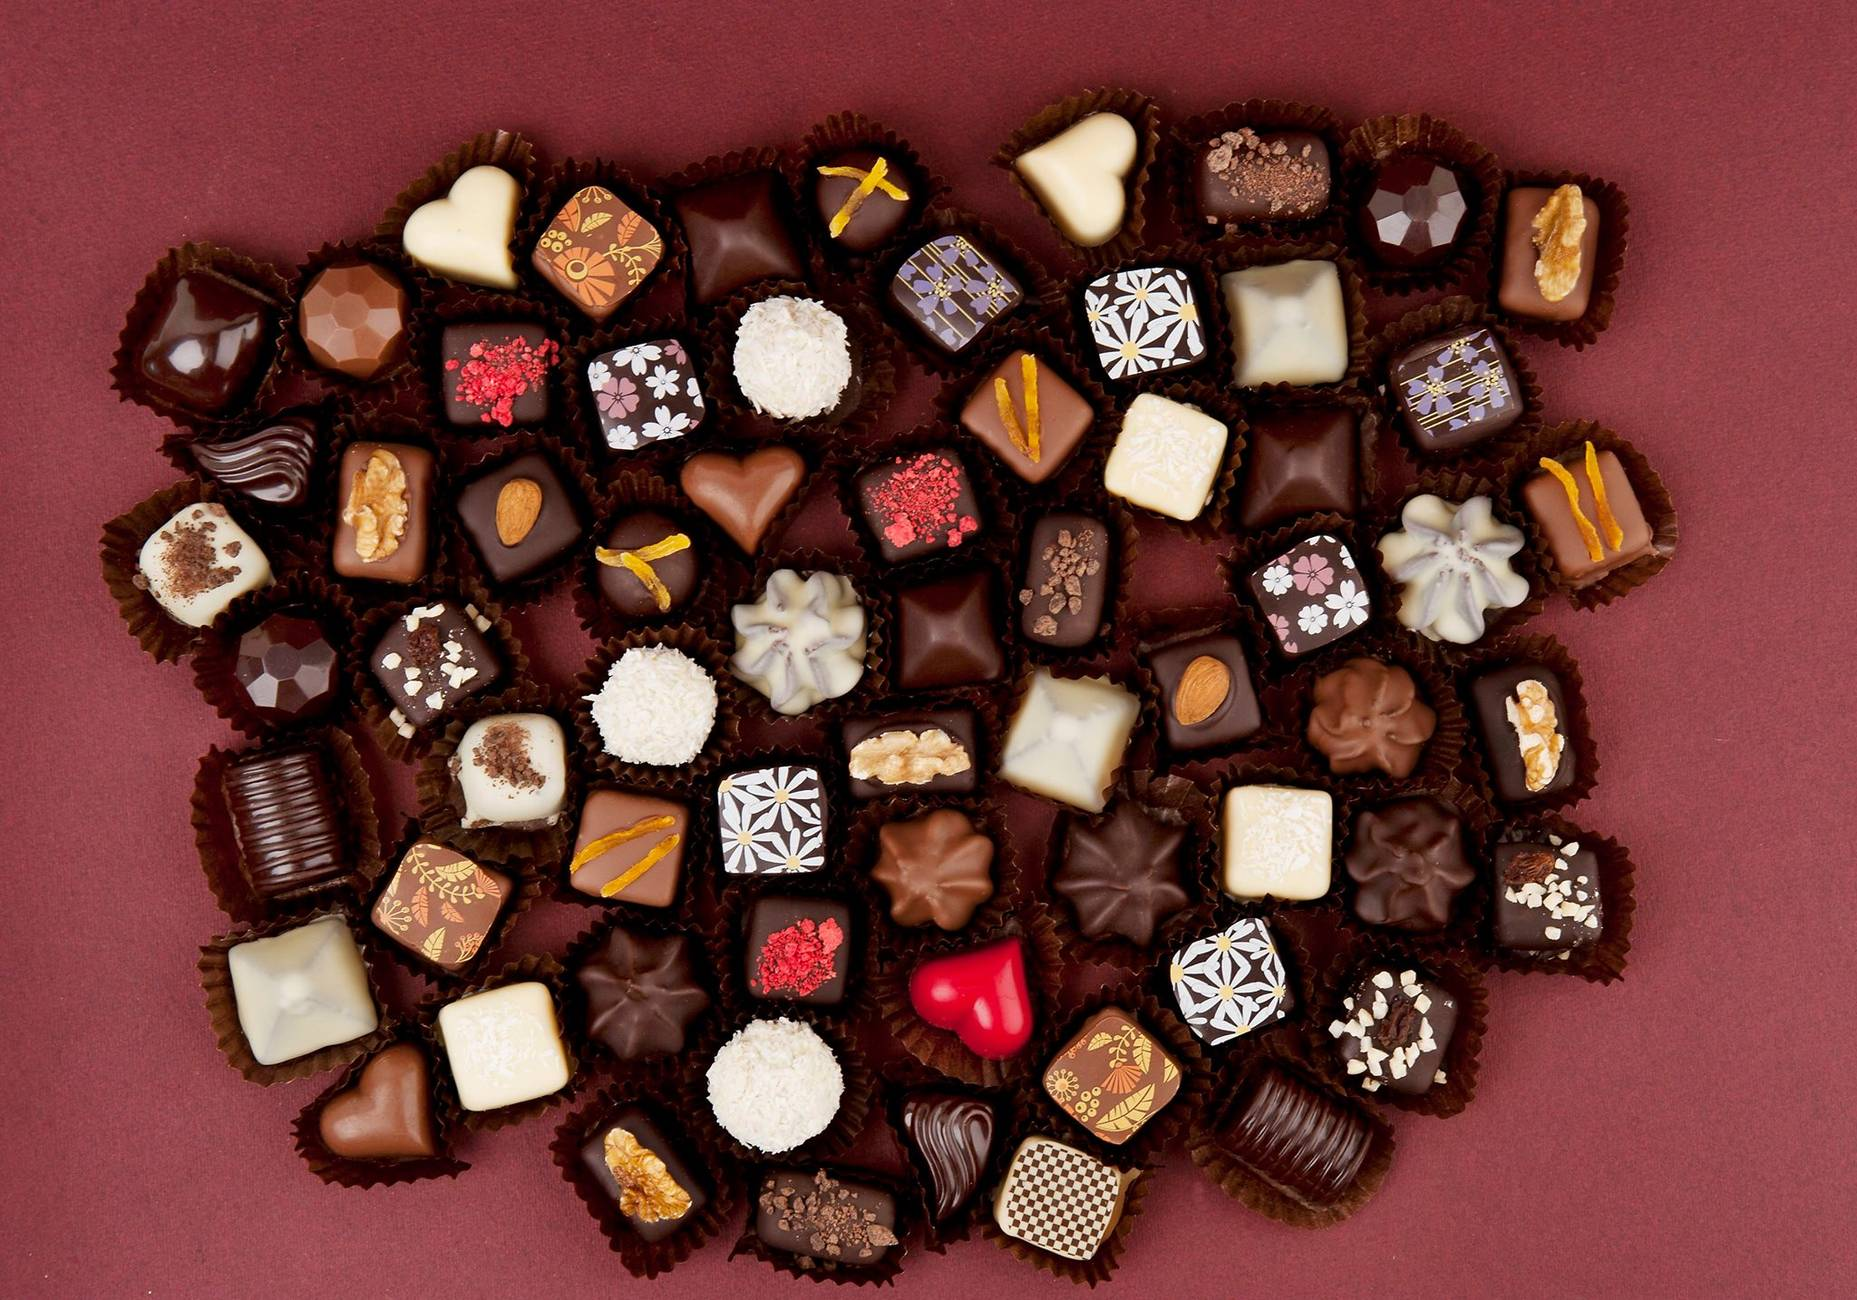 Anneli Viik hand made chocolate in Tallinn,Estonia